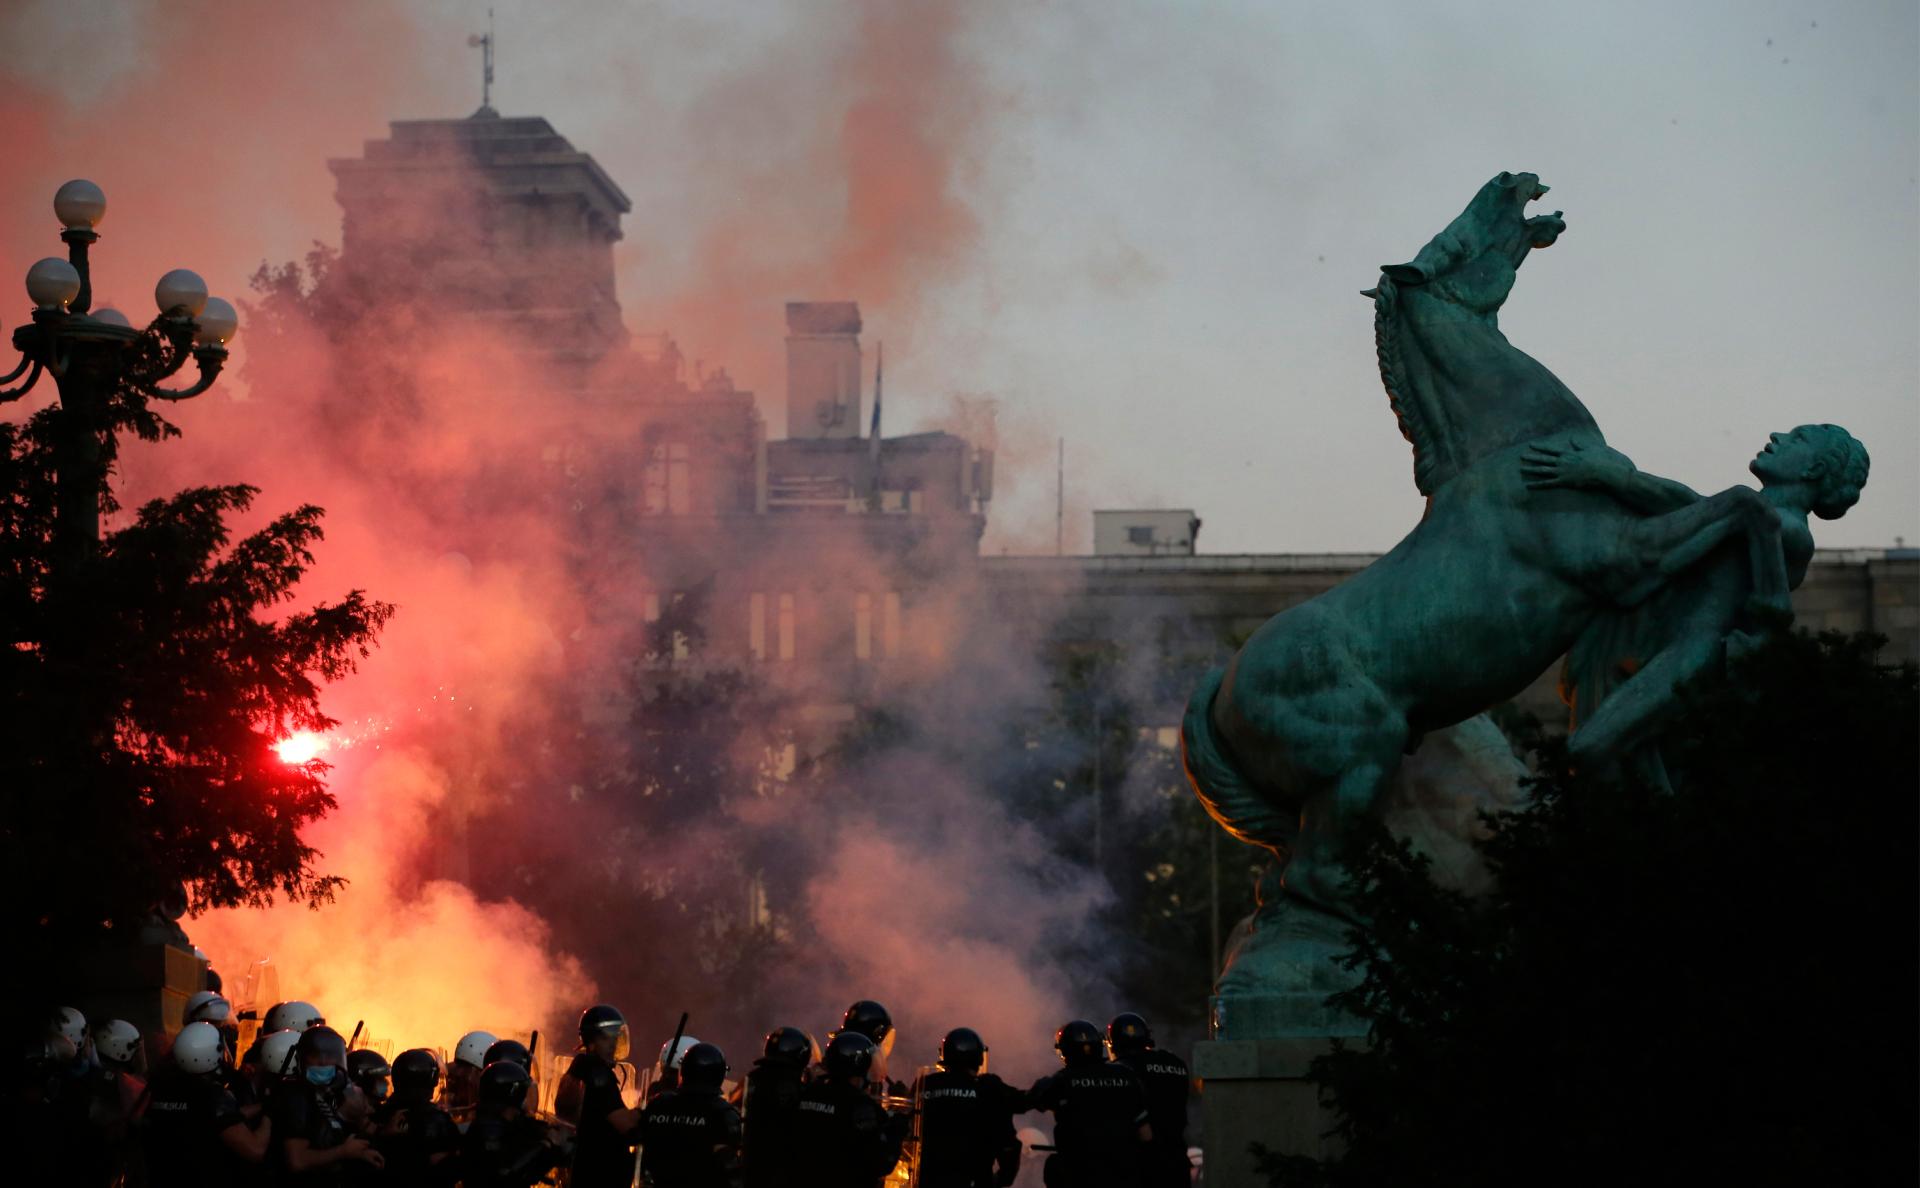 МВД Сербии объяснило протесты против карантина попыткой захвата власти